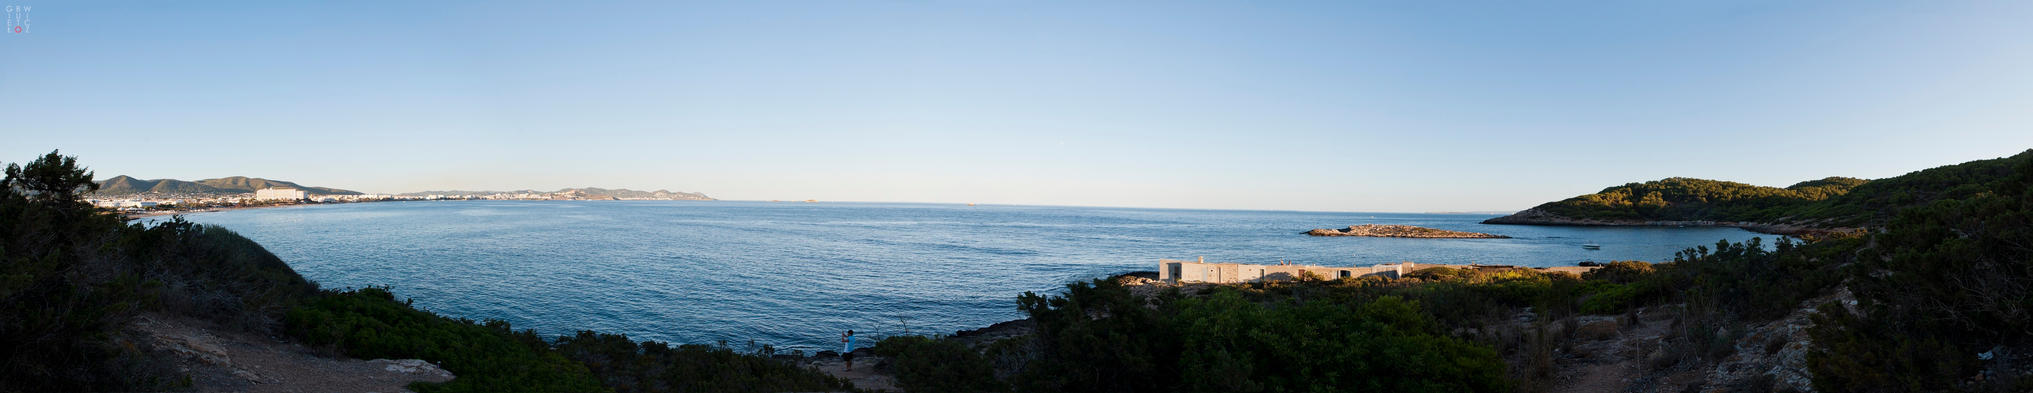 Eivissa by tgielbutowicz